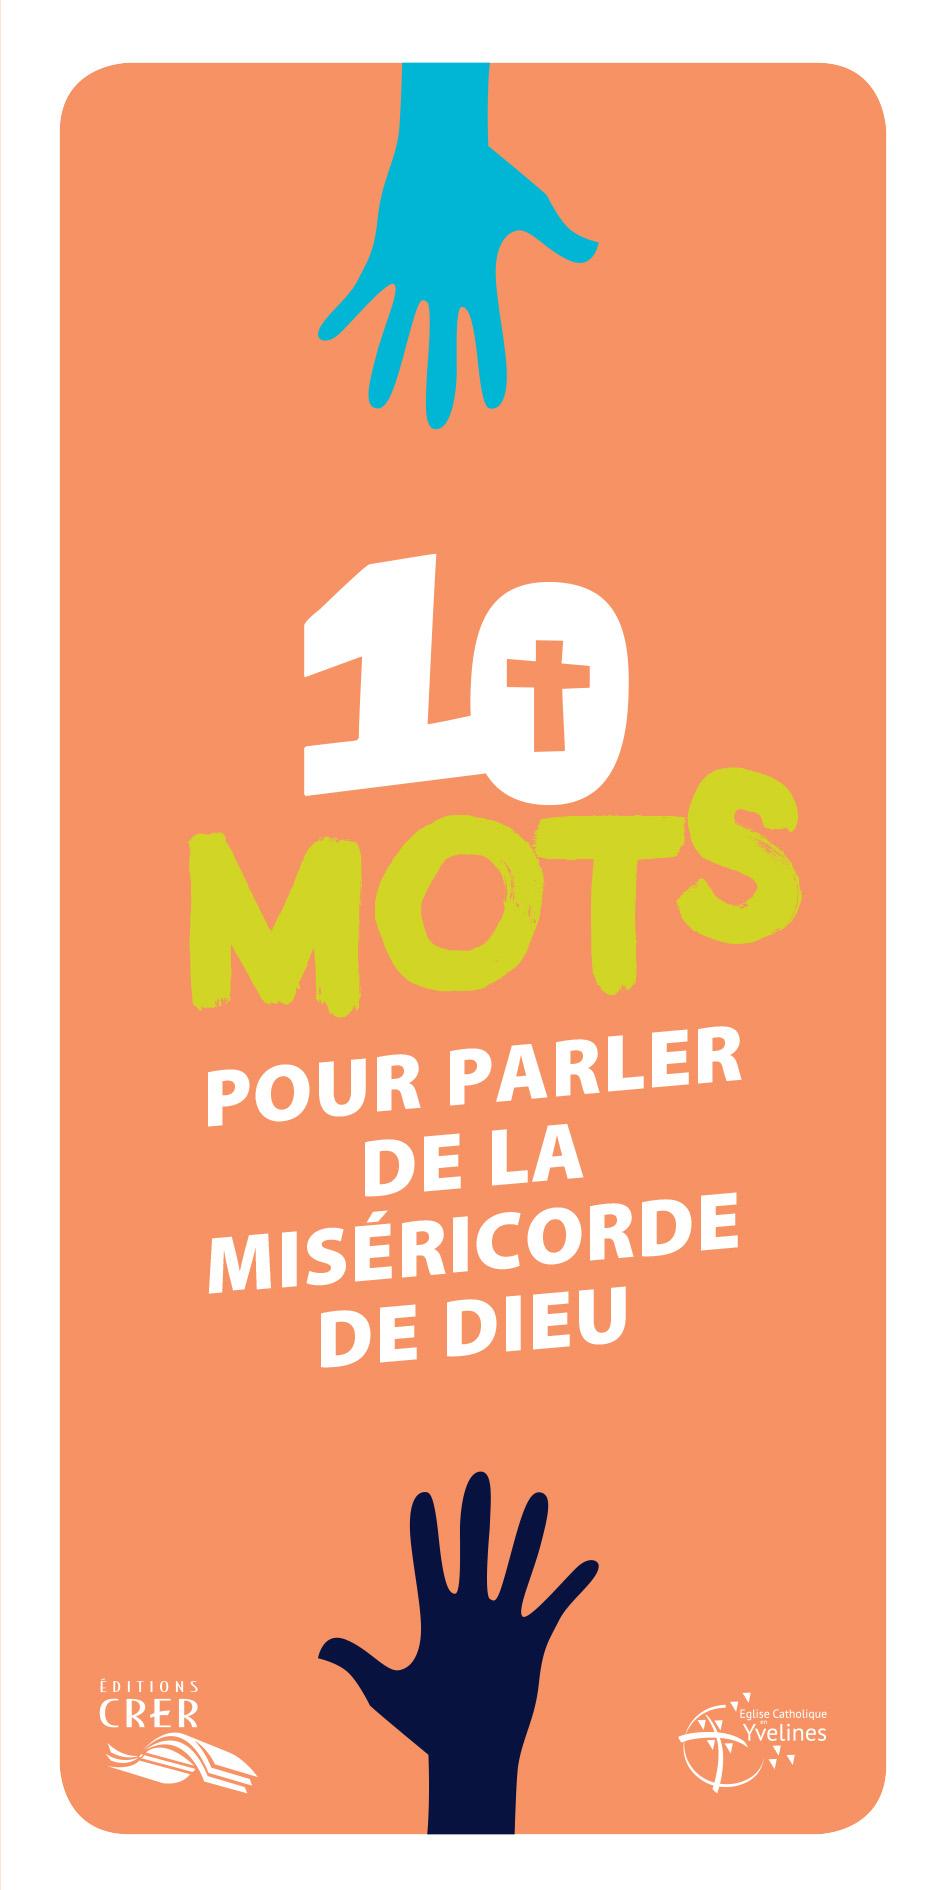 MEP_10rites_MisericorDieu_IMPO.indd